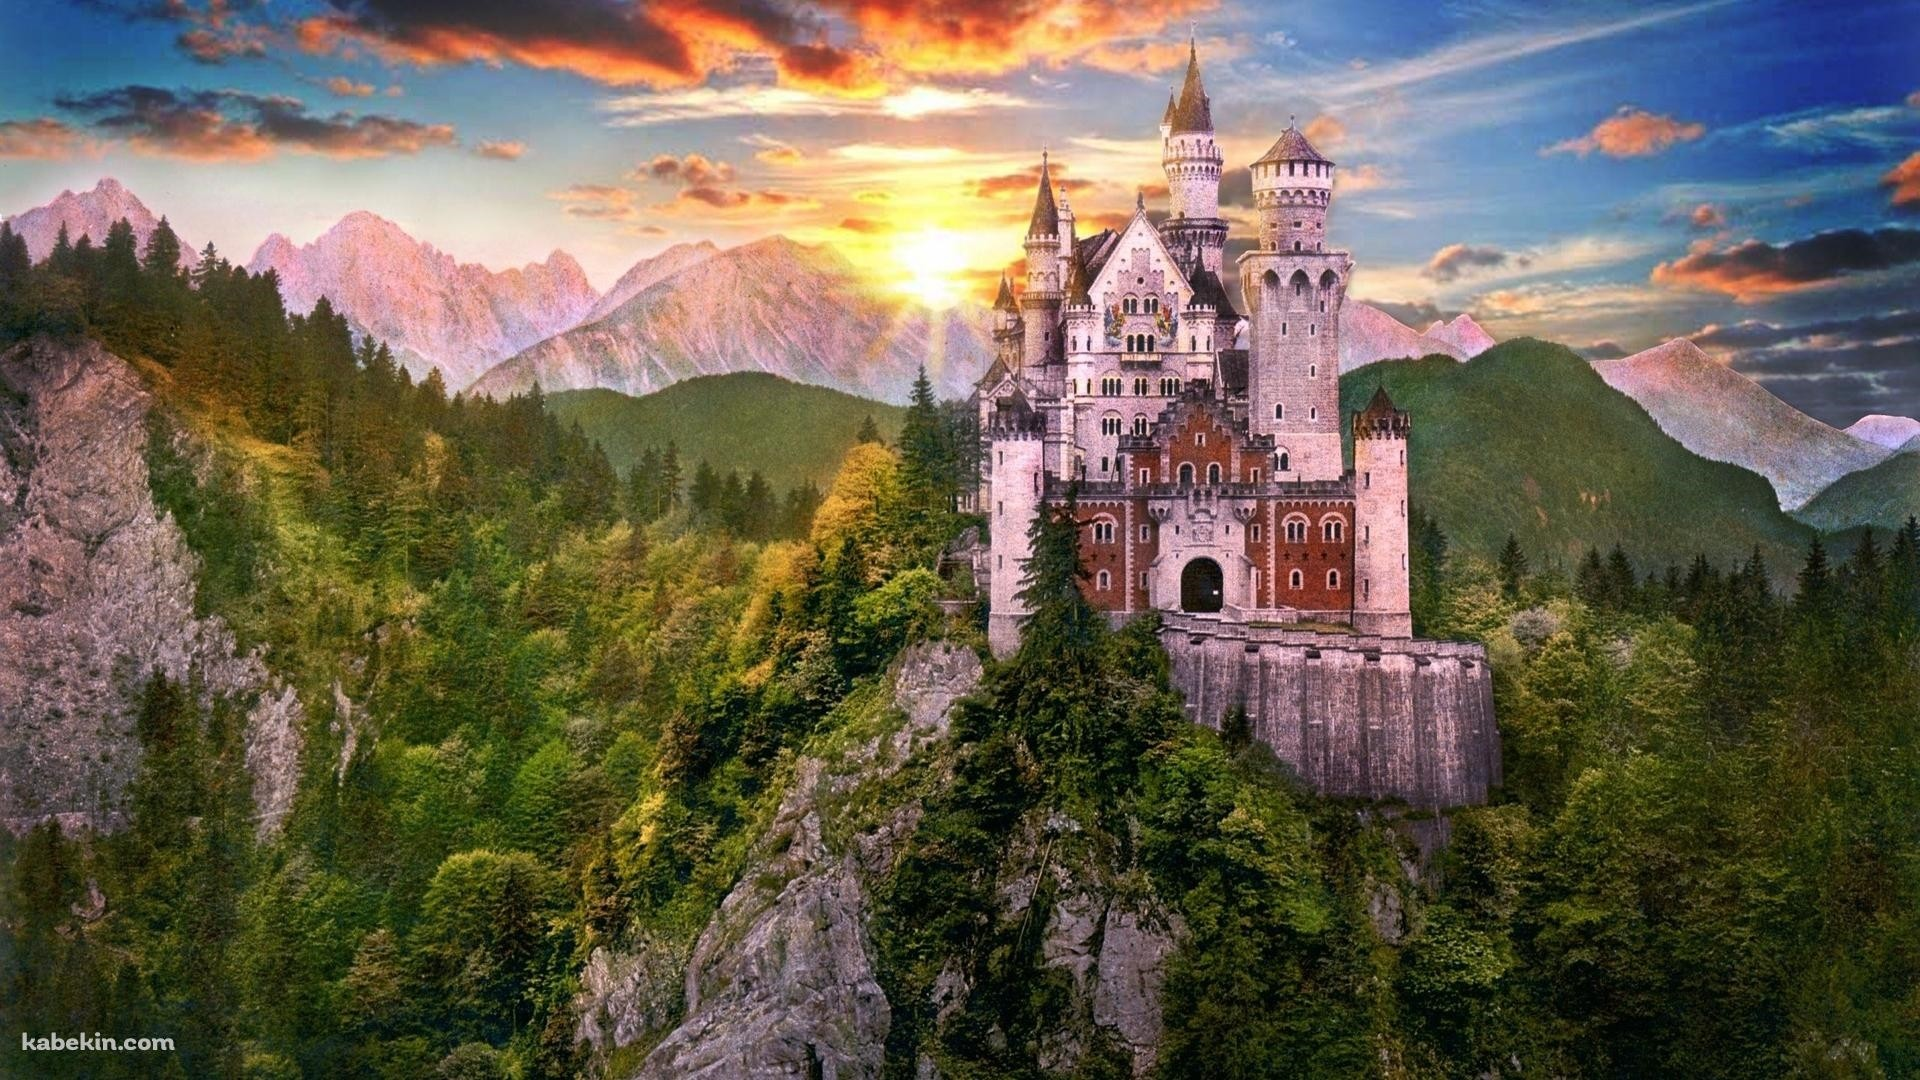 Castle Wallpaper Picture hd